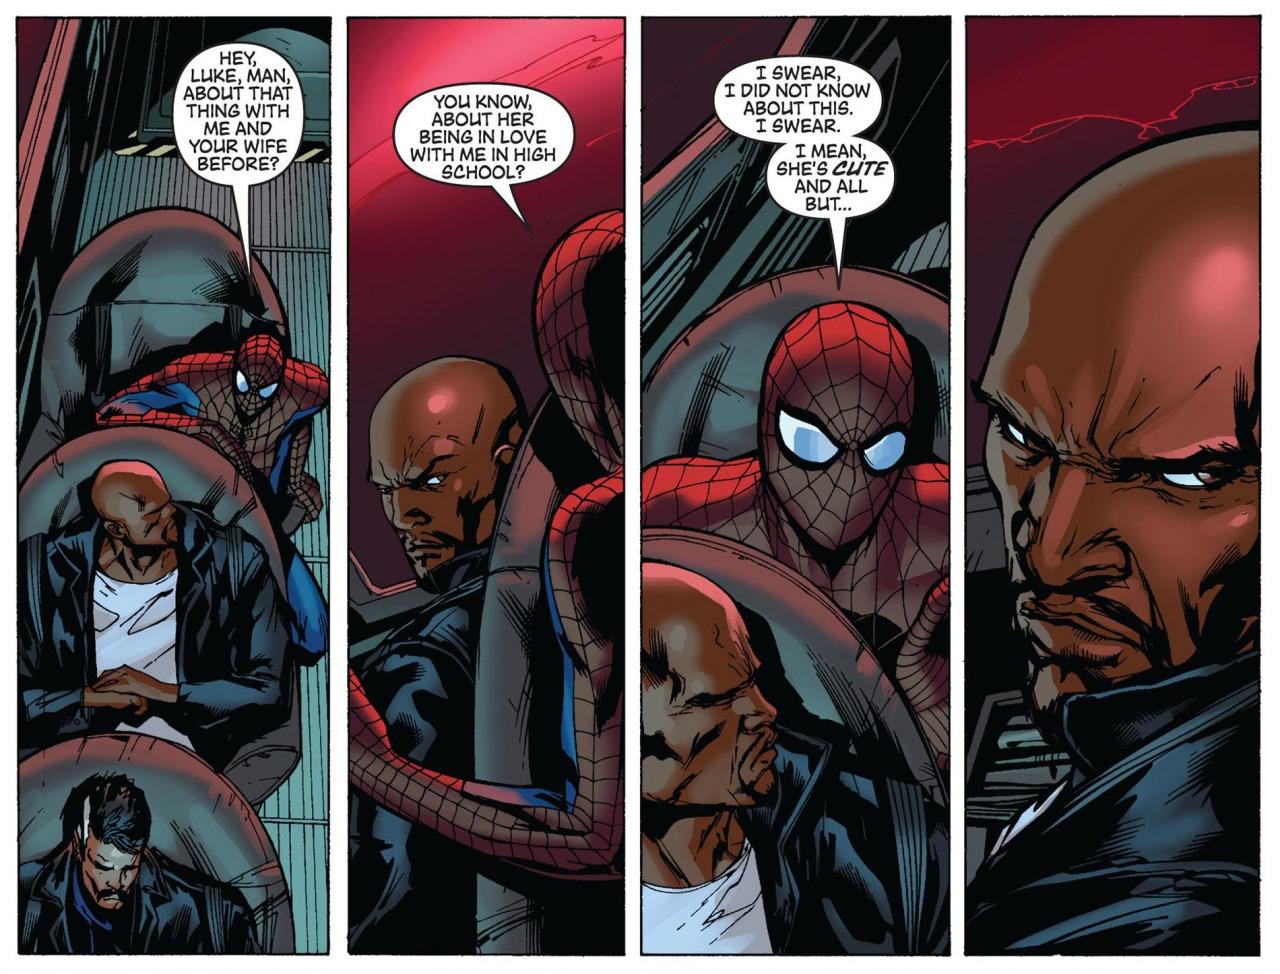 Spider-Man Luke Cage The New Avengers